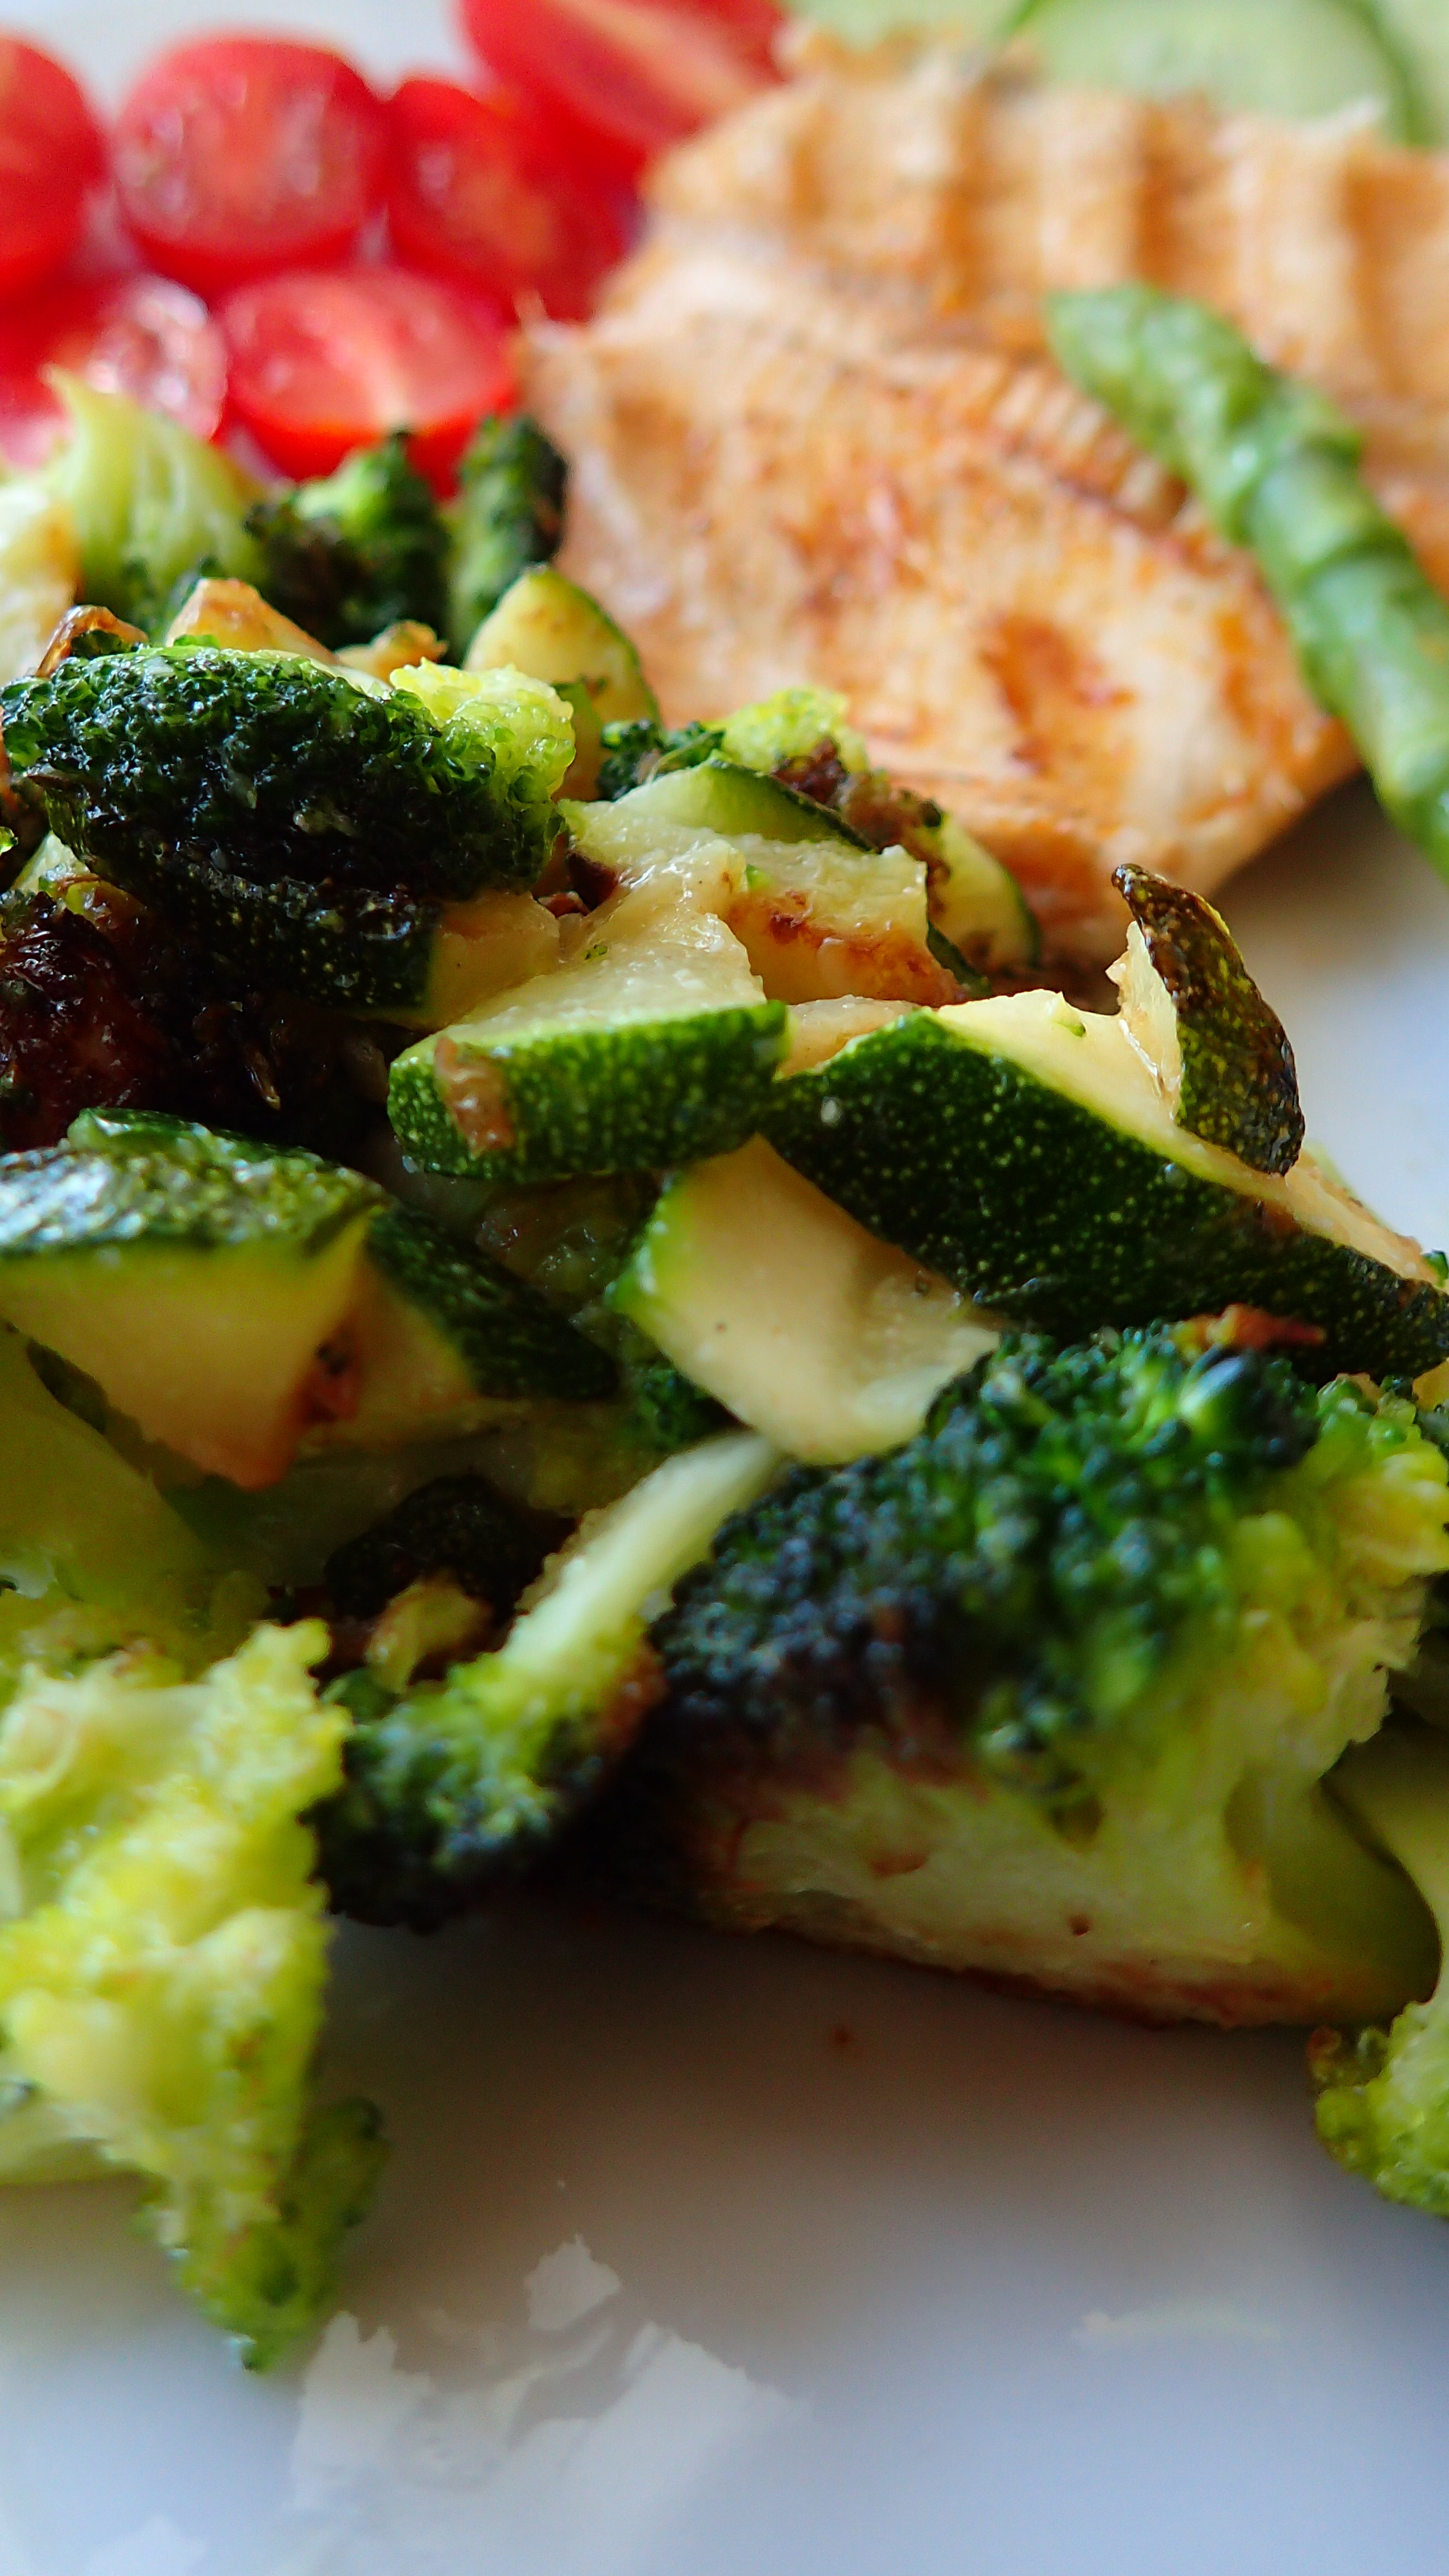 Low Carb Roasted Vegetables  KETO DINNER FOR 2 Crispy skin grilled trout & roasted